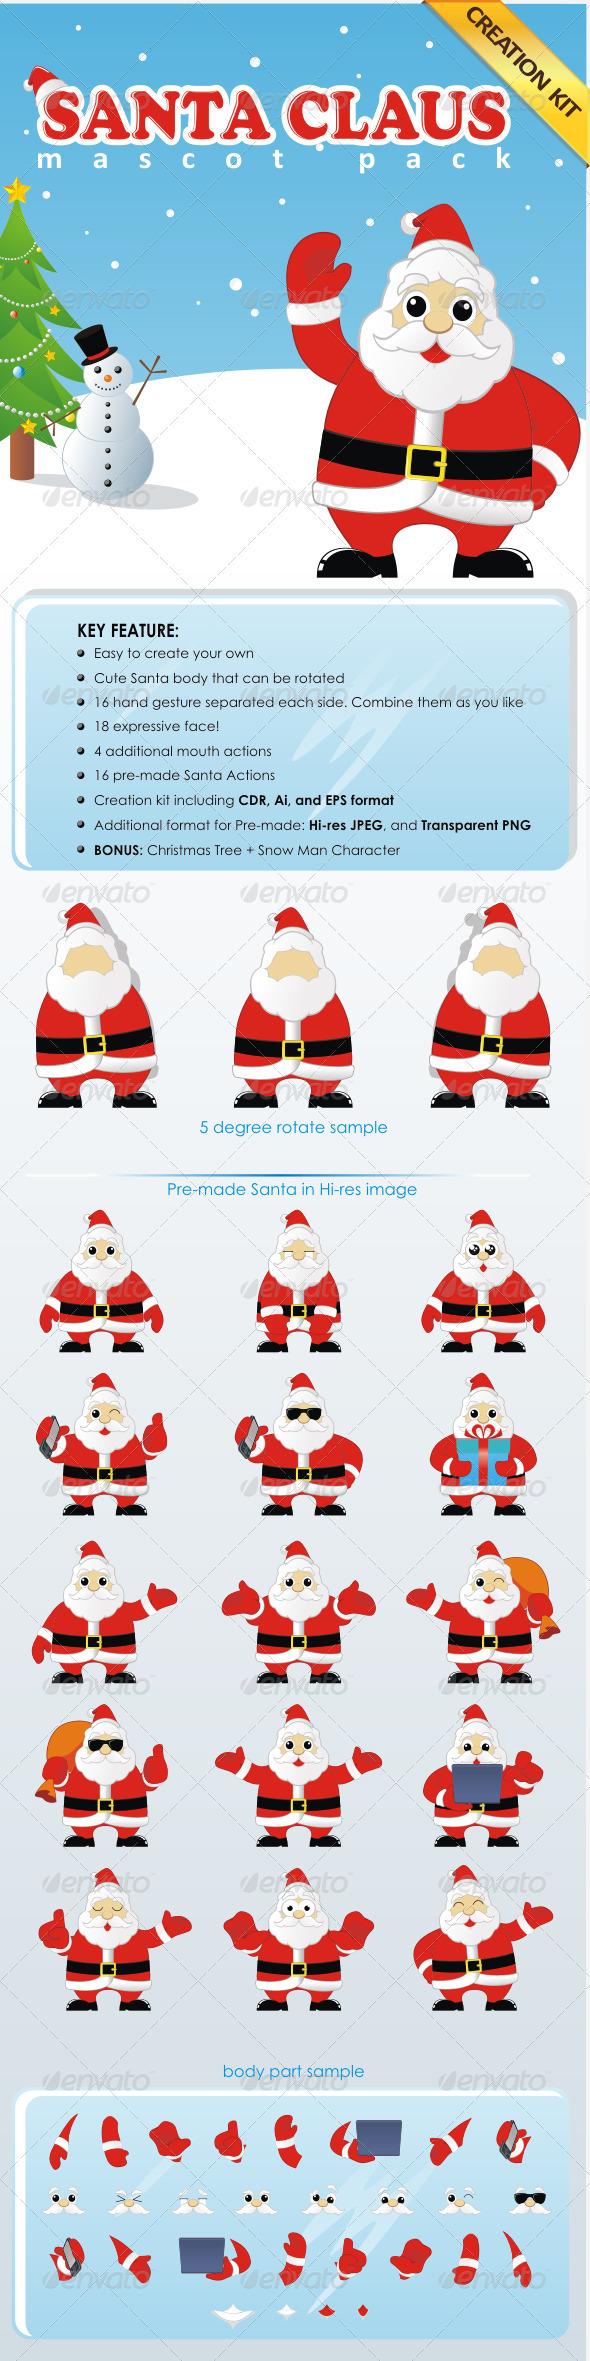 Santa Claus Mascot Pack - Creation Kit - People Characters